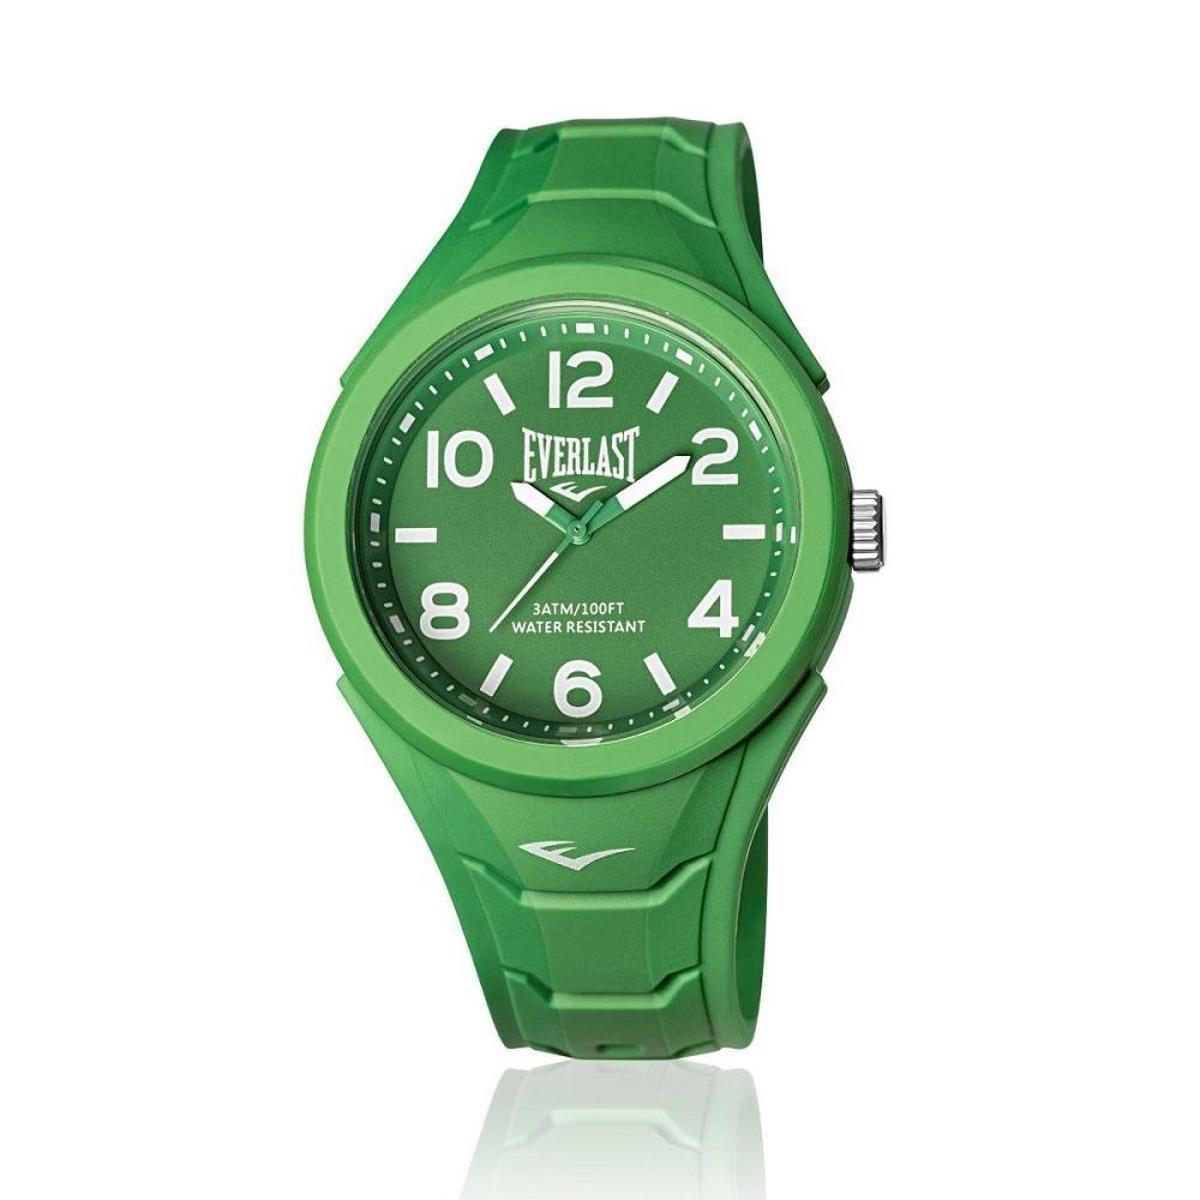 dd19796b404 Relógio Pulso Everlast Shape Caixa Abs Revestido Silicone